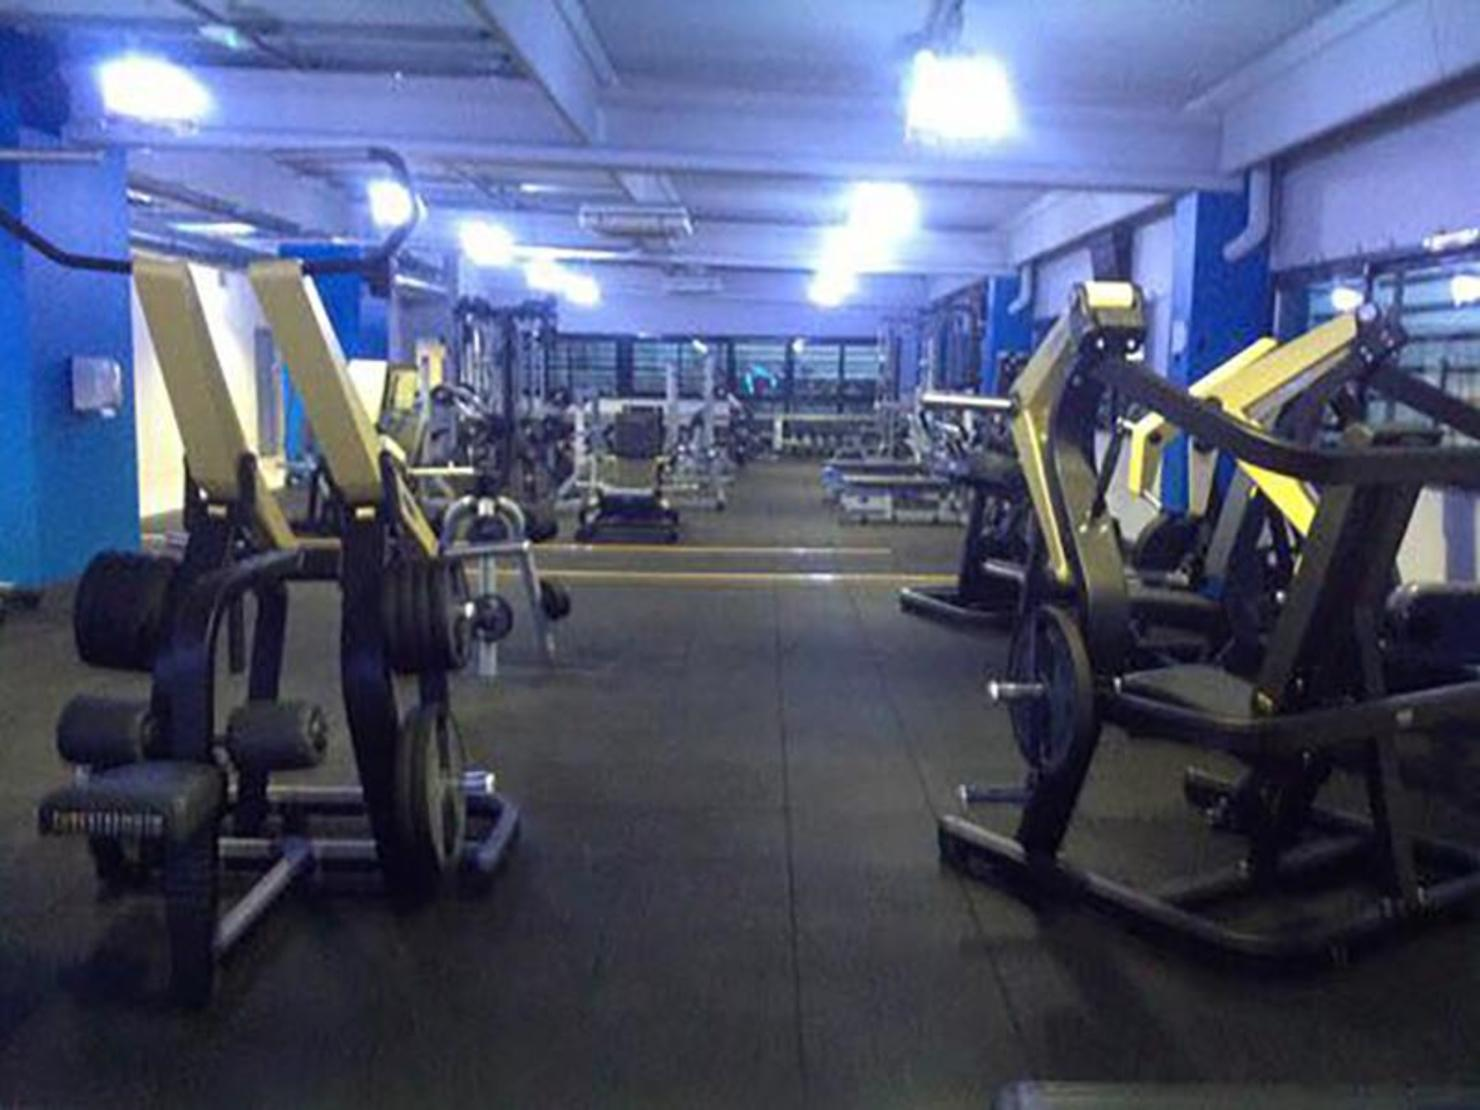 Fitness Park Aubagne